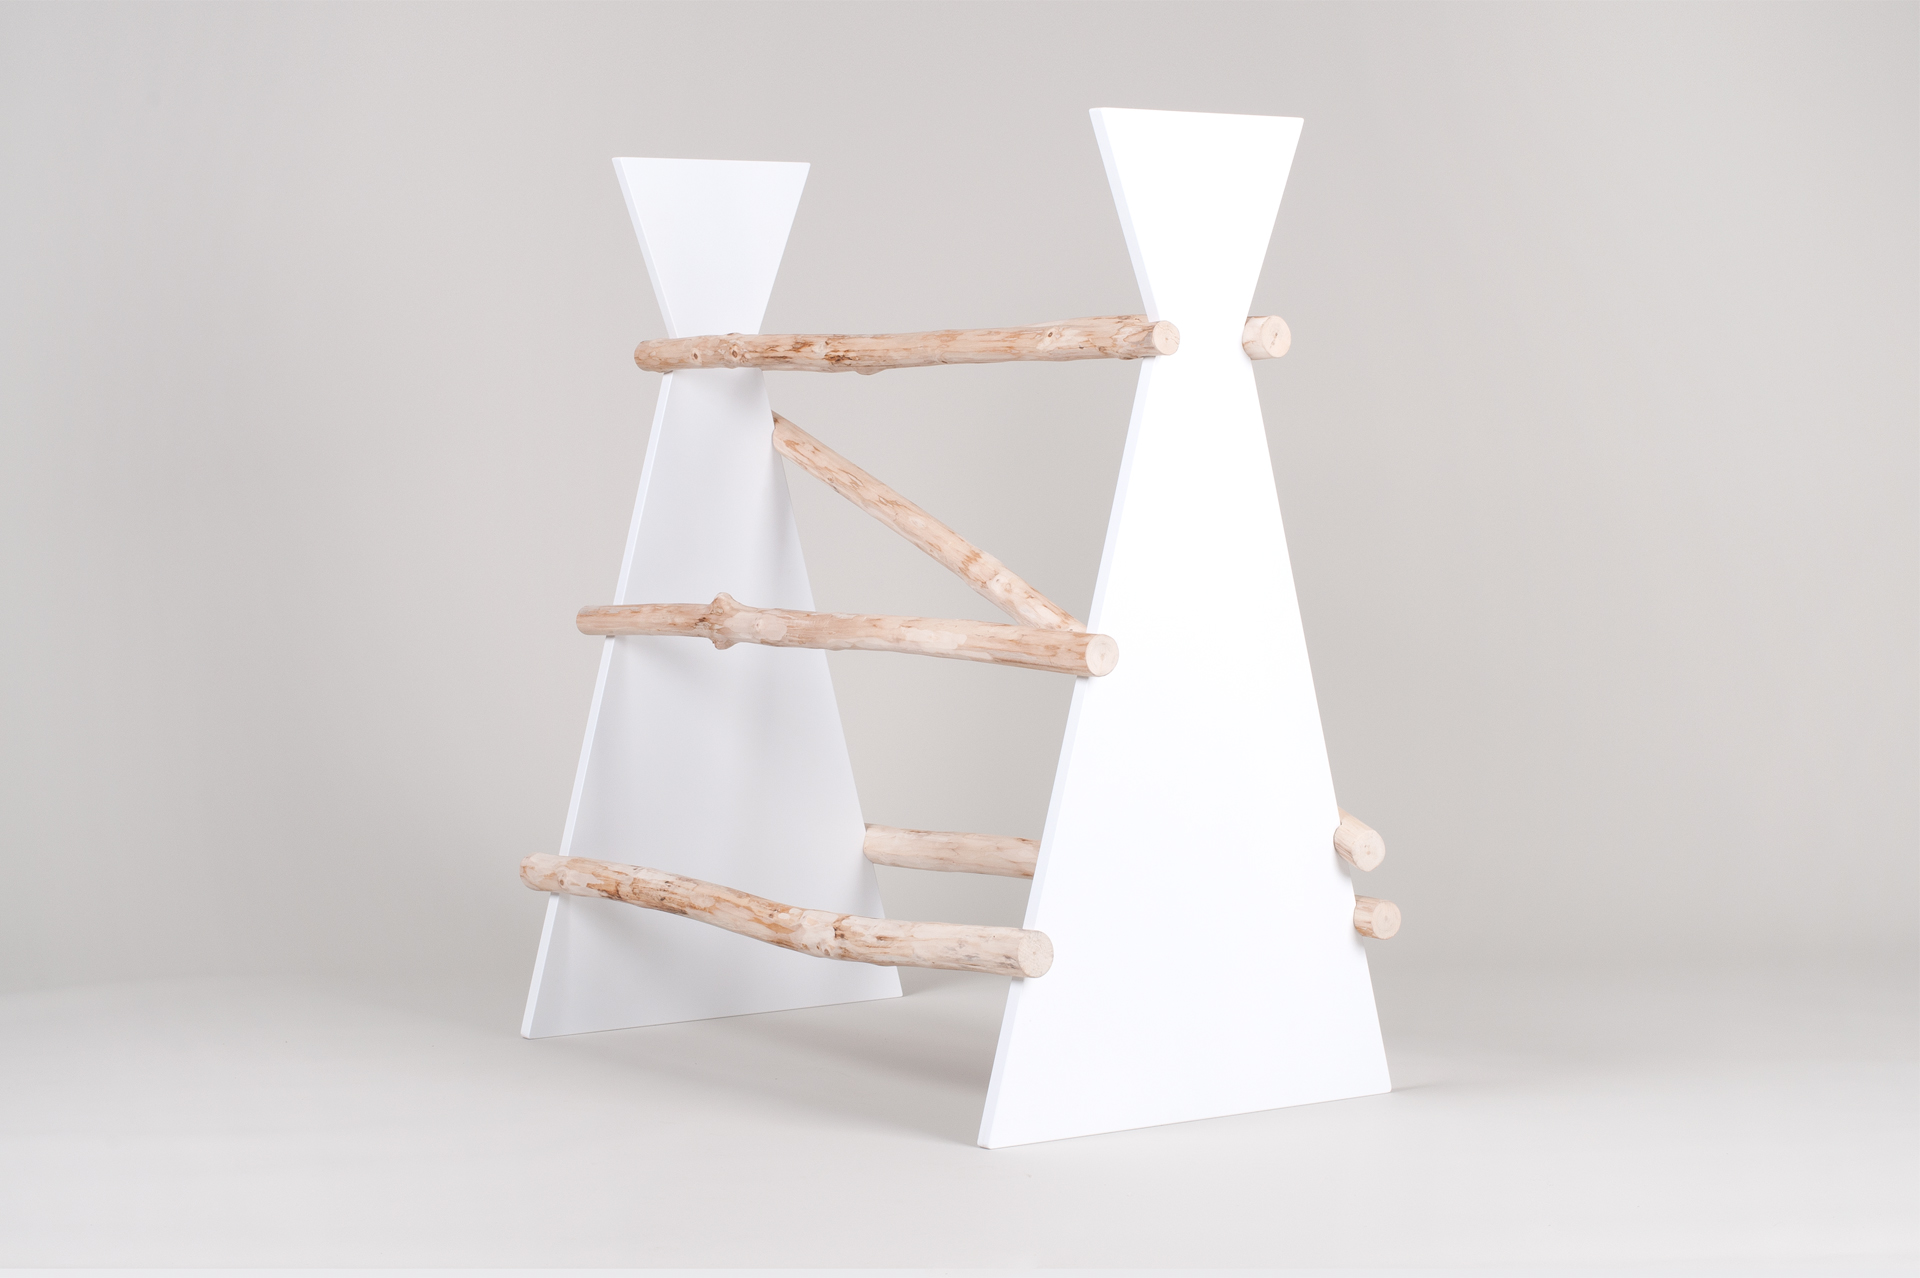 hanger design, hanger, nemy sluha, dizajn nemy sluha, design, product design, object design, hanger, vesiak, produkt dizajn,  veronika paluchova, dizajner, designer, traditional design, culture, product designer